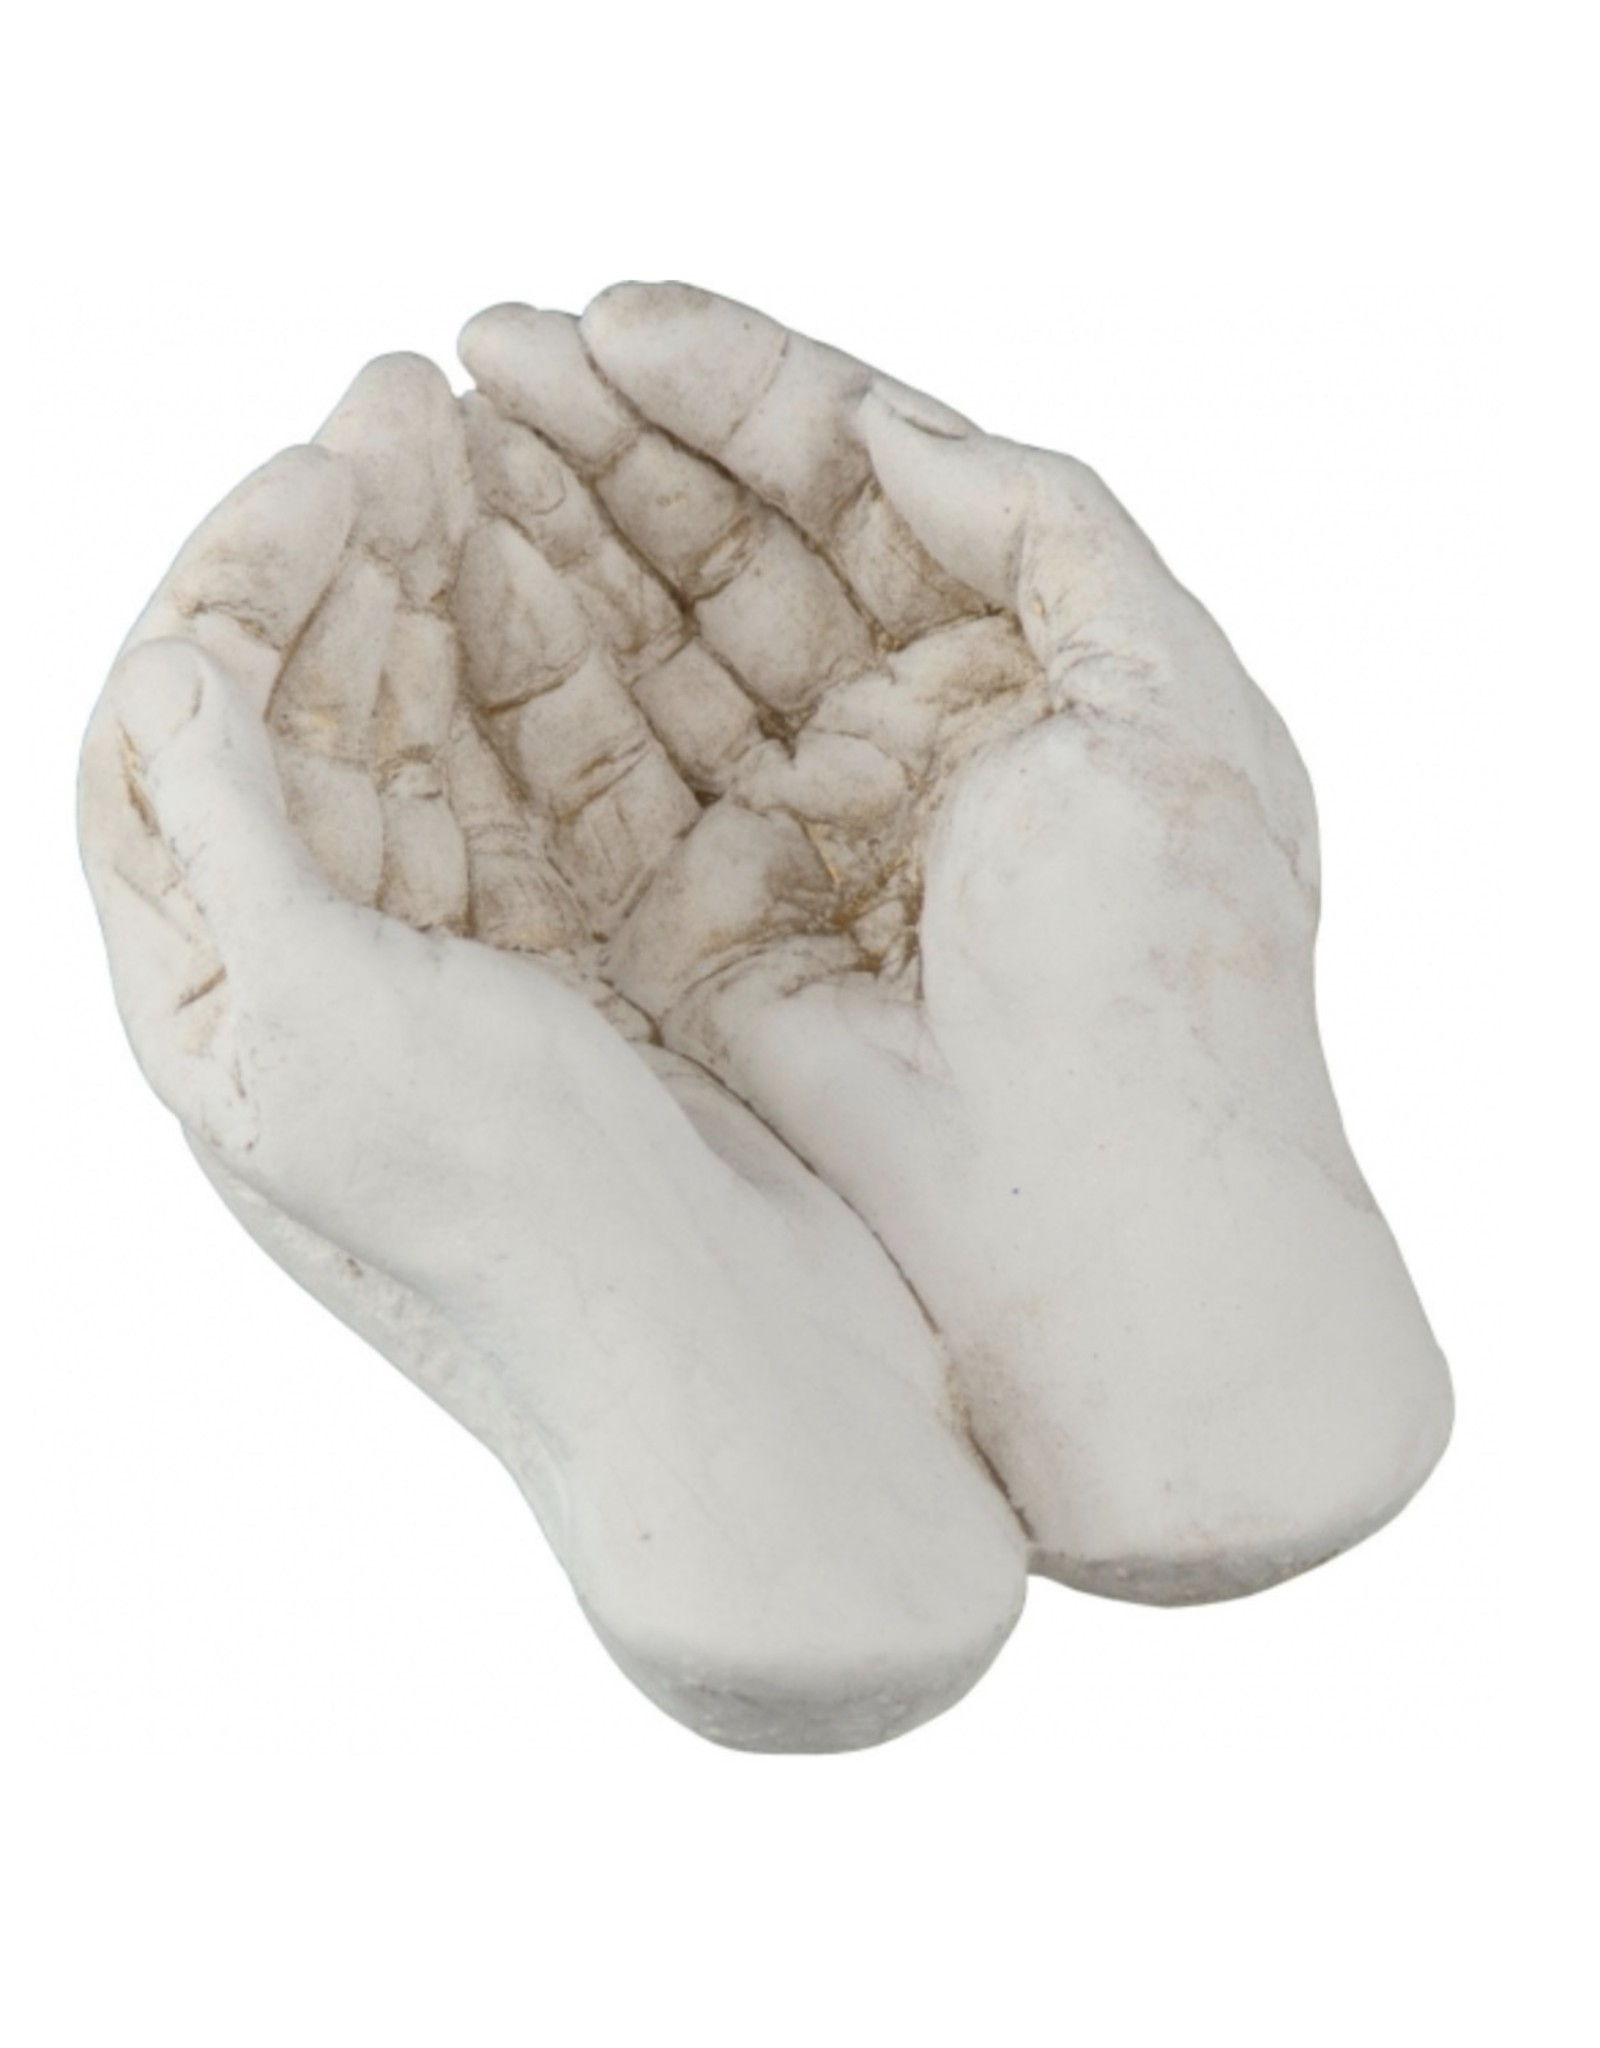 Gypsum Cement Figurine Gods Hands - Large